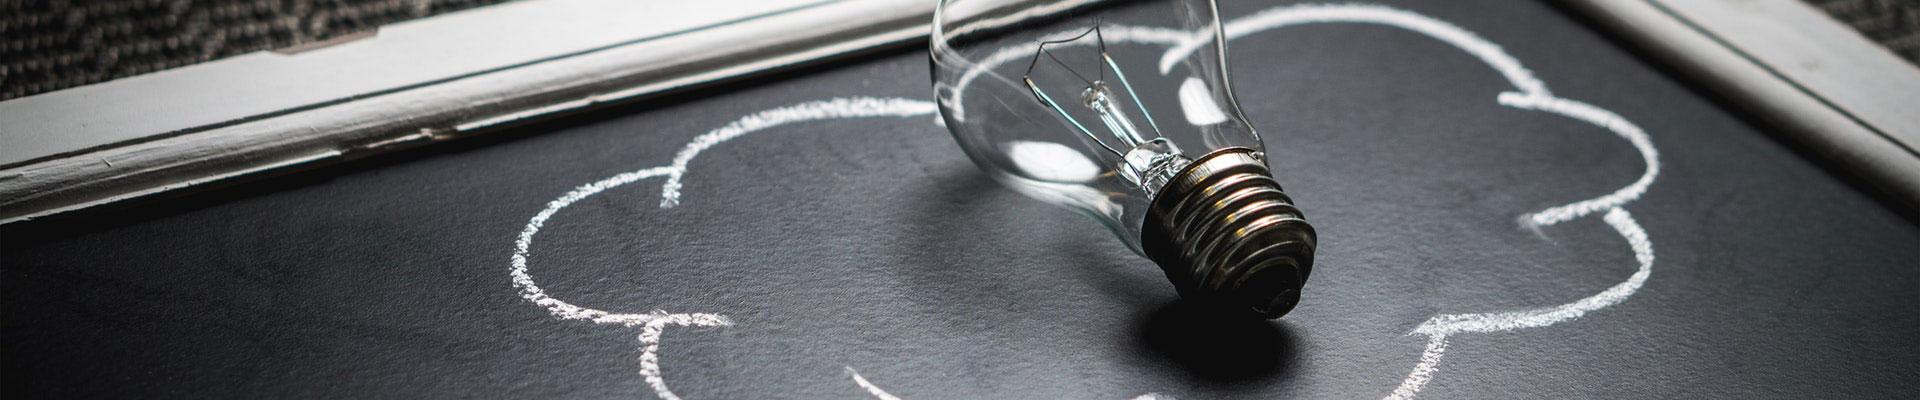 wissensmanagement innovation